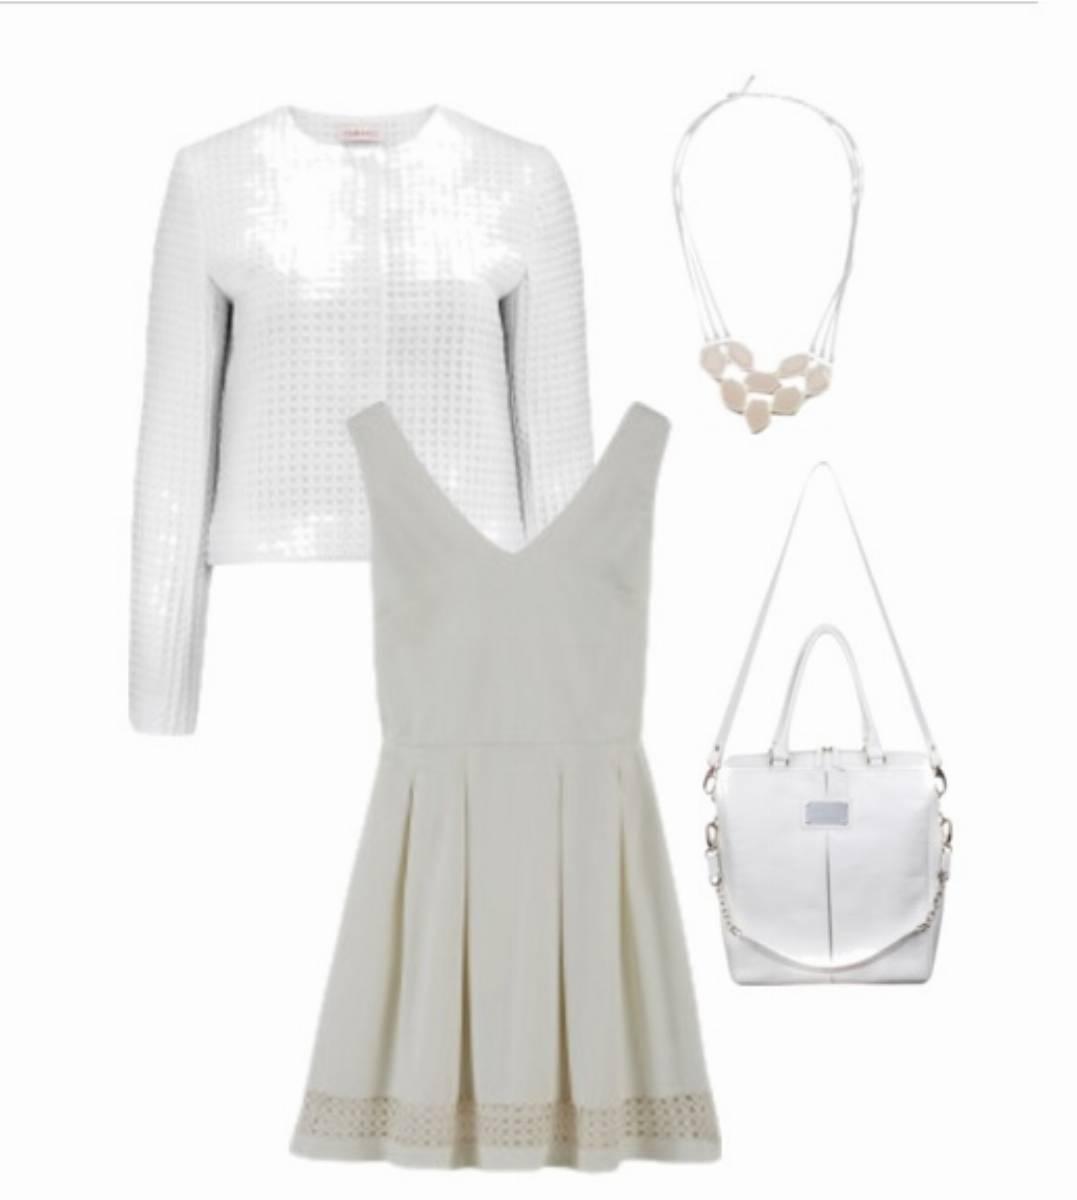 BialaSukienka4 - Biały Total Look